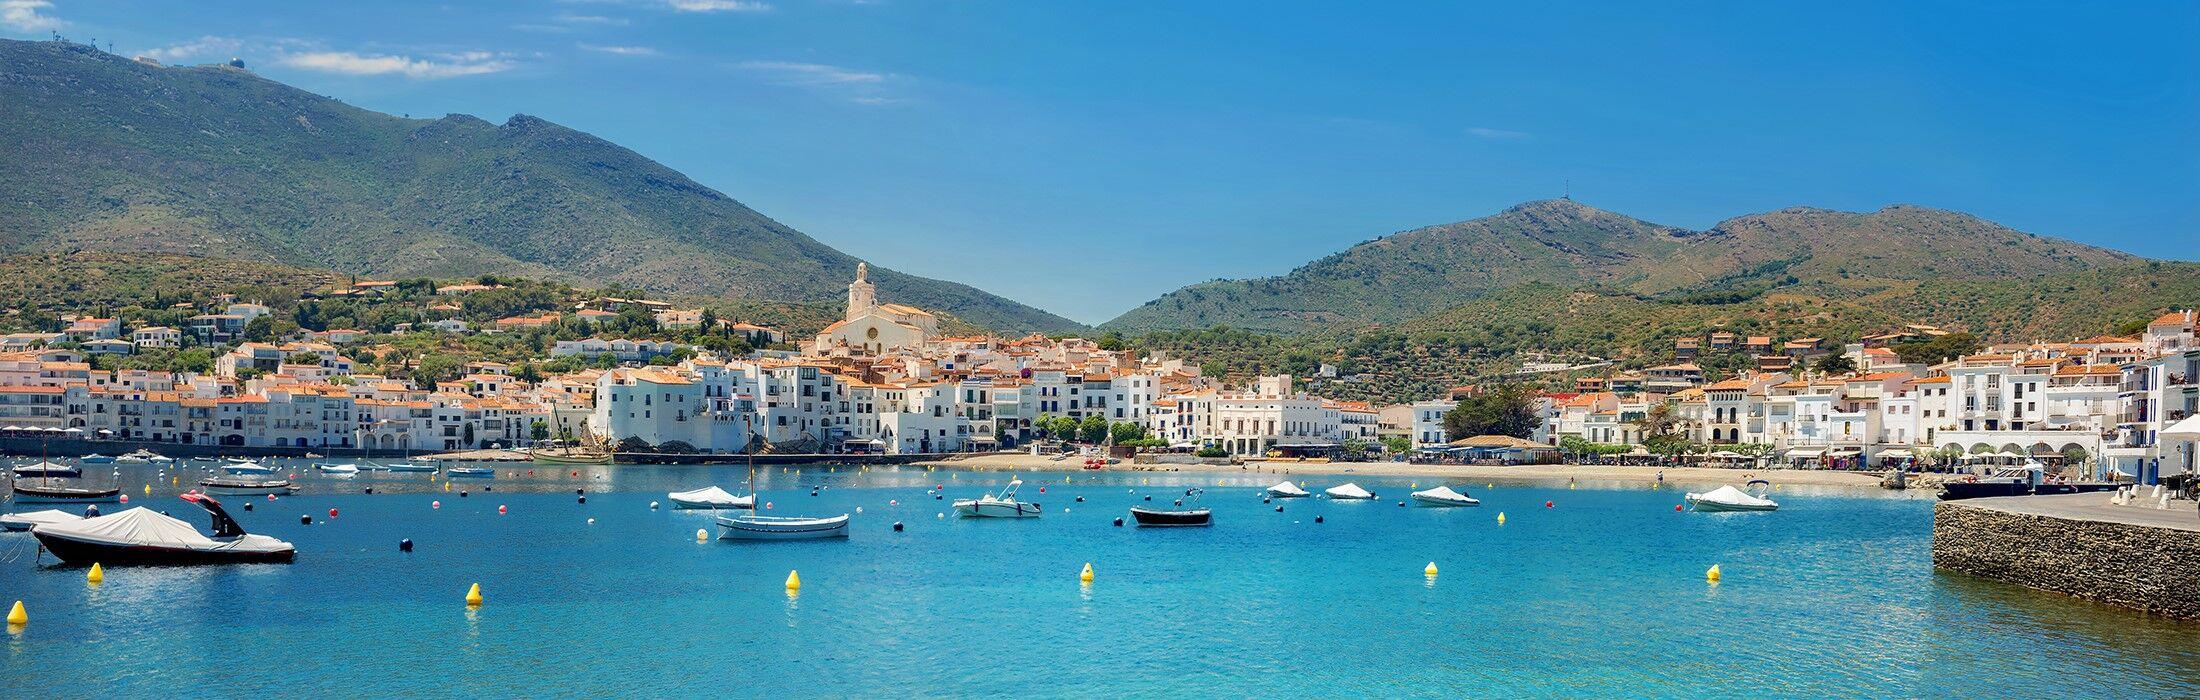 location vacances espagne italie croatie